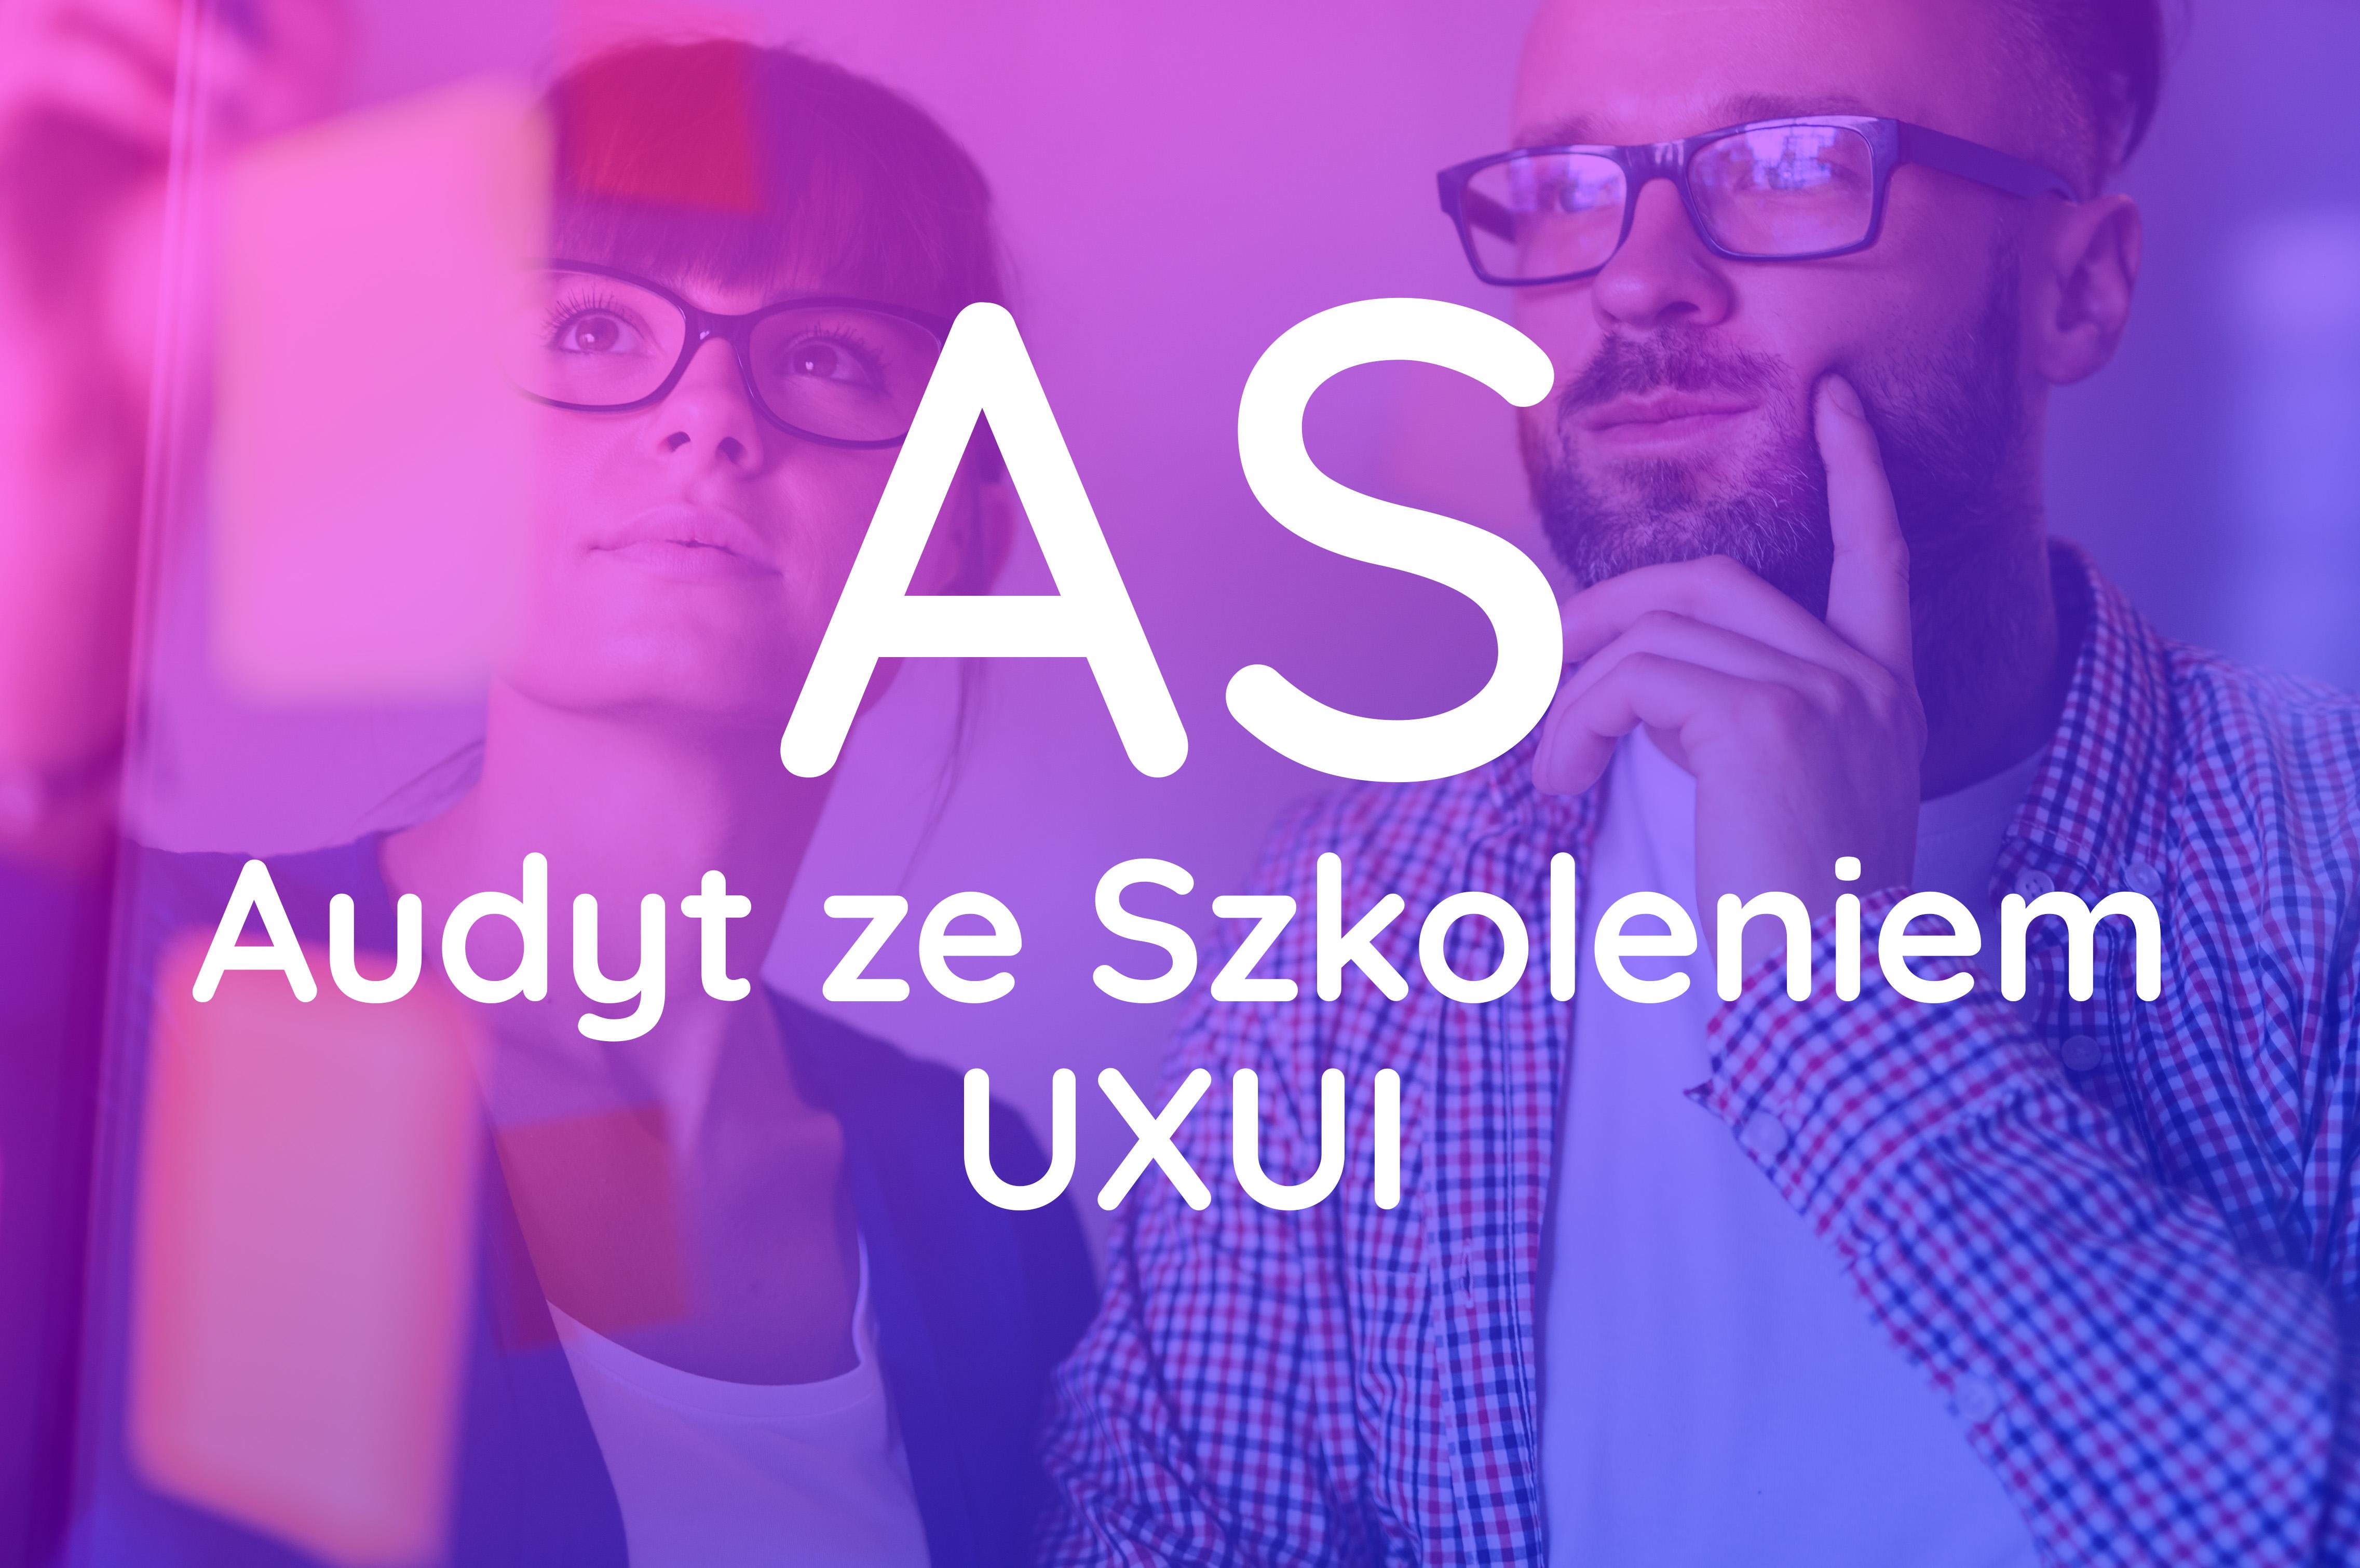 Audyt ze Szkoleniem UXUI